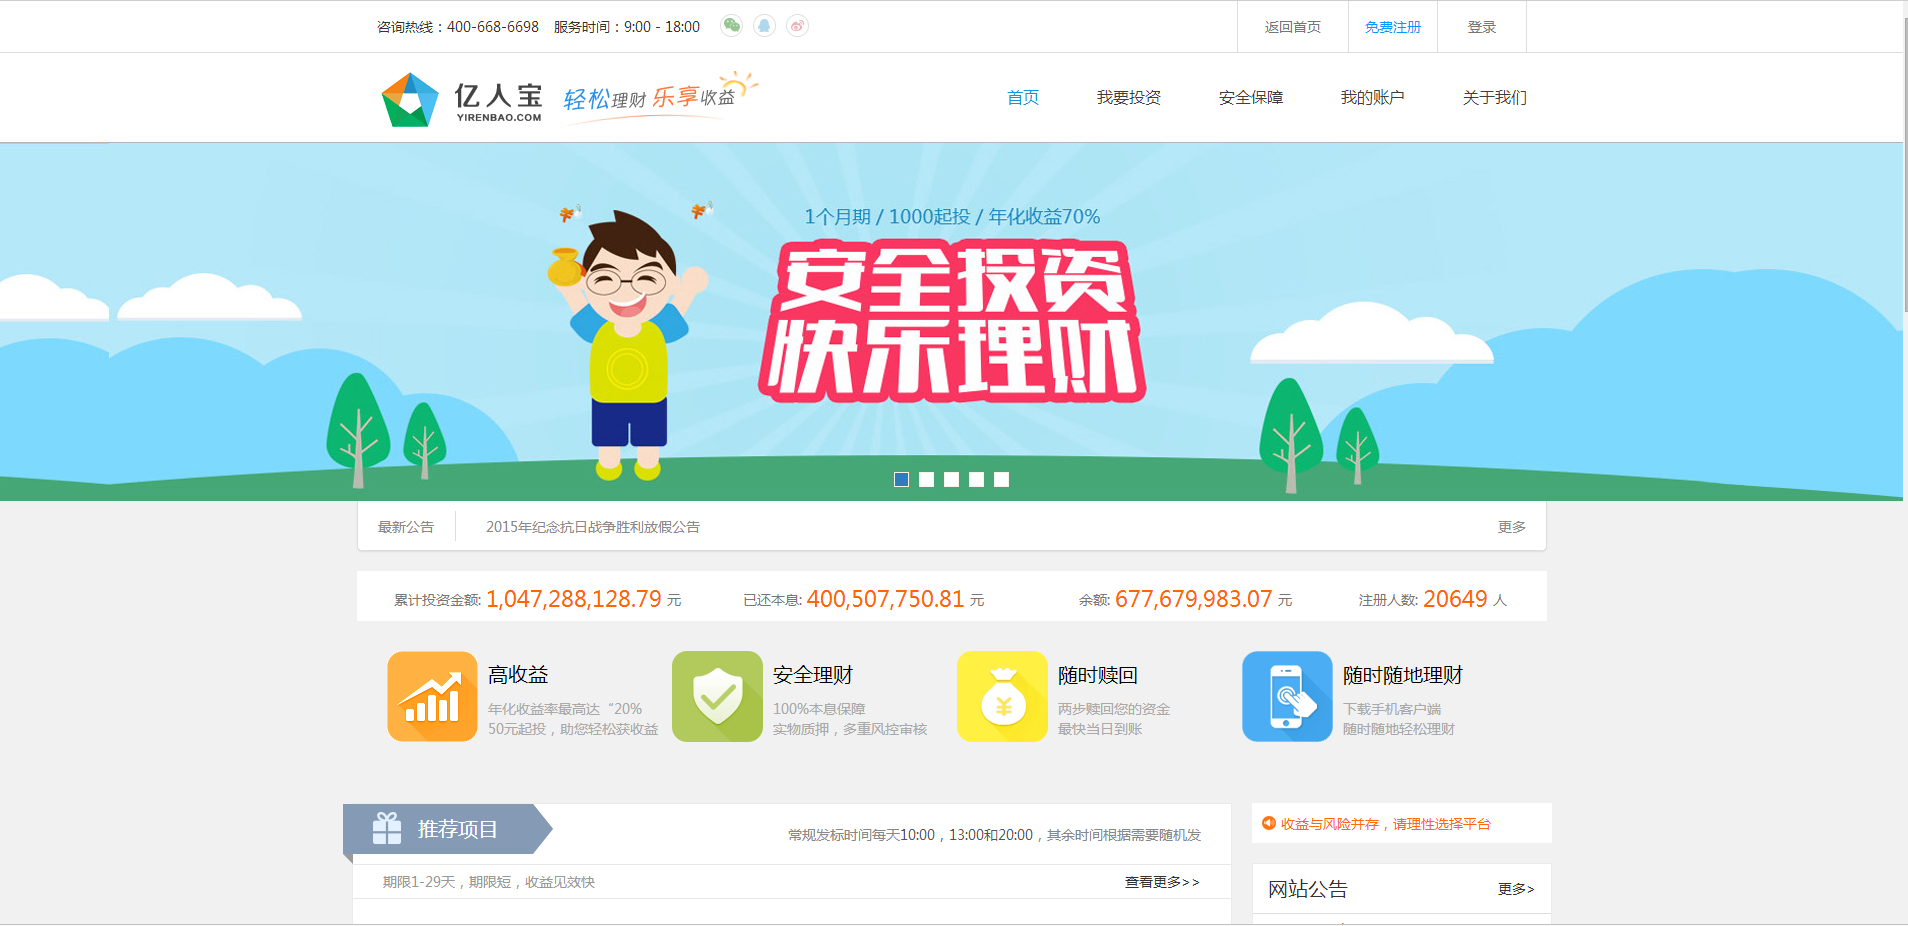 P2P网贷投资理财平台网站模板全套